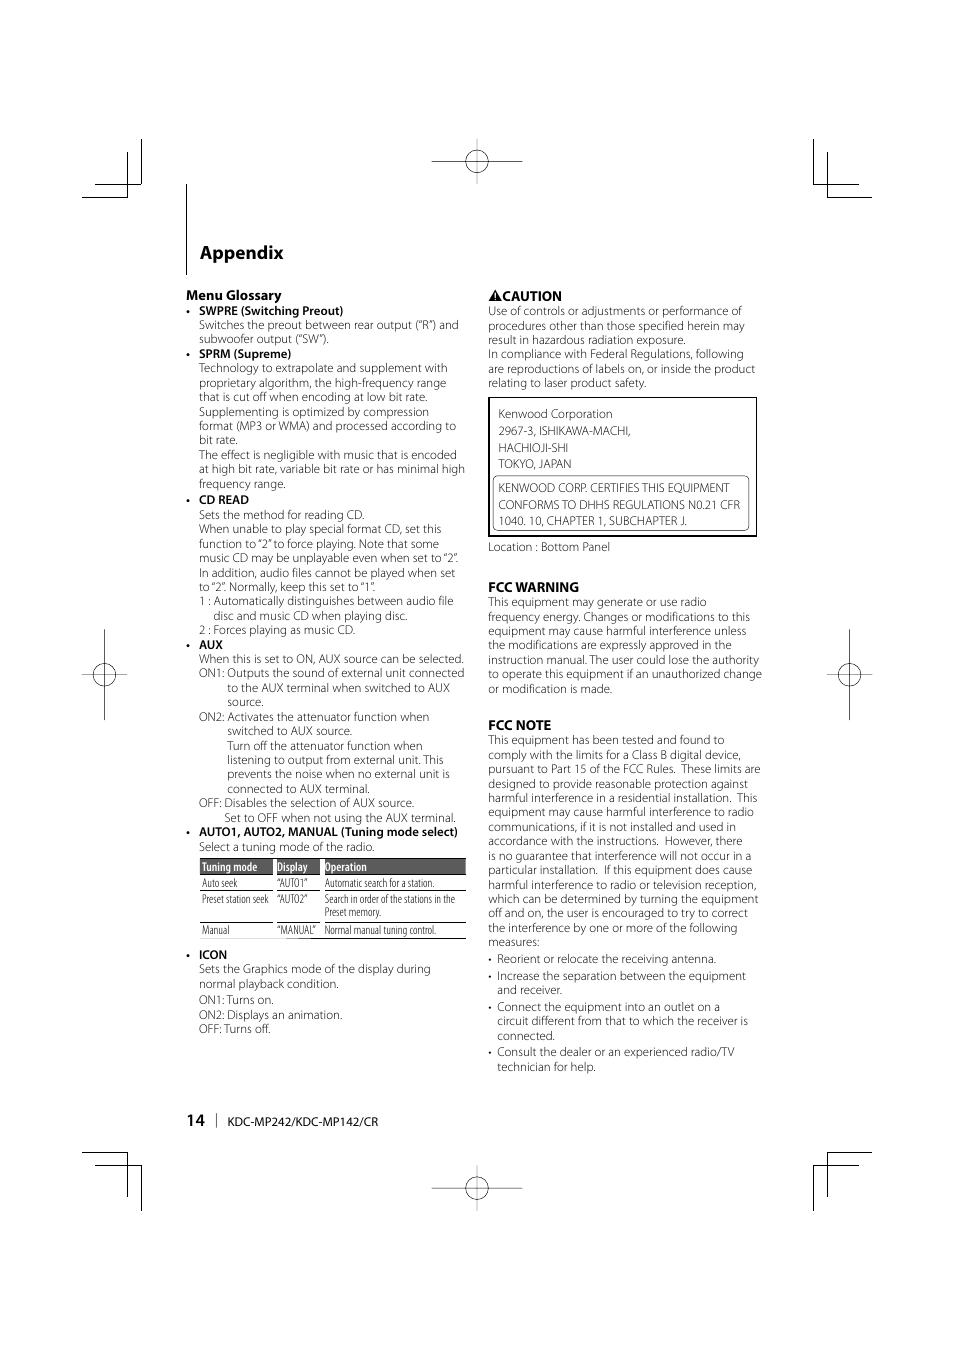 Kenwood Kdc Mp142 Manual Wiring Diagram 142 Appendix User Page 14 56 Original Mode Rh Manualsdir Com Sleeve Protect